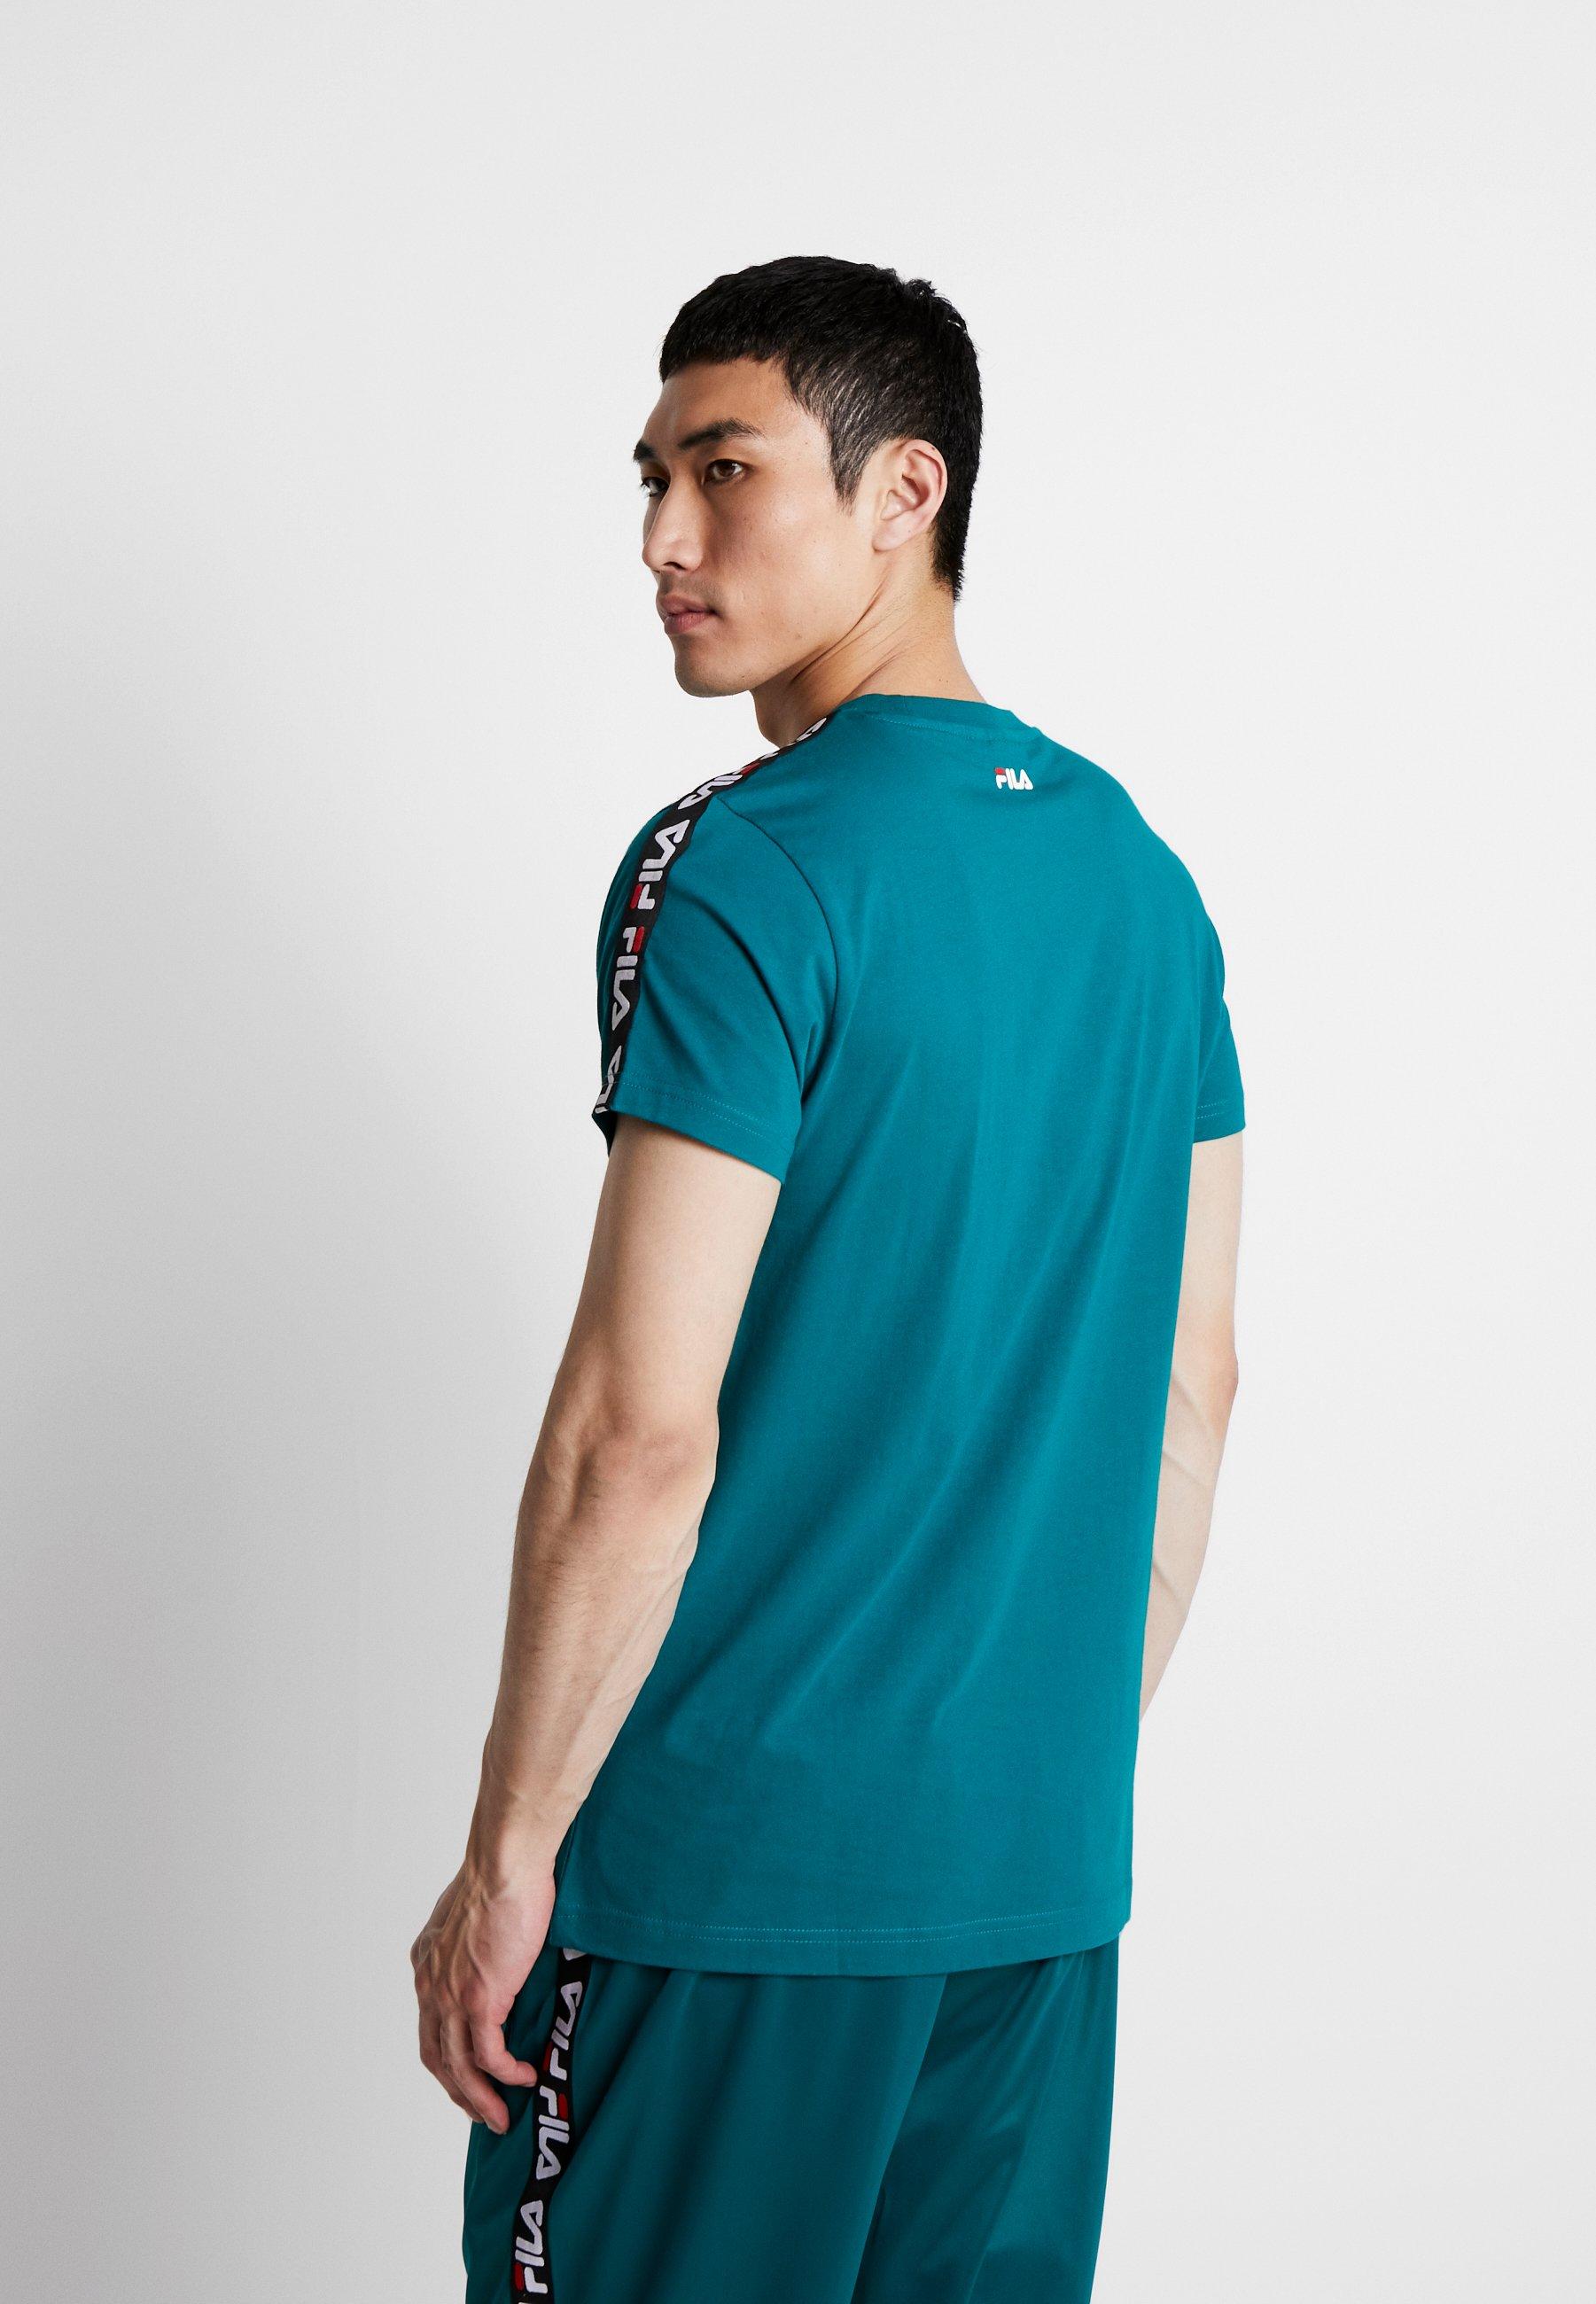 Imprimé Fila shirt TeeT Vainamo Everglade QhrCtdxs